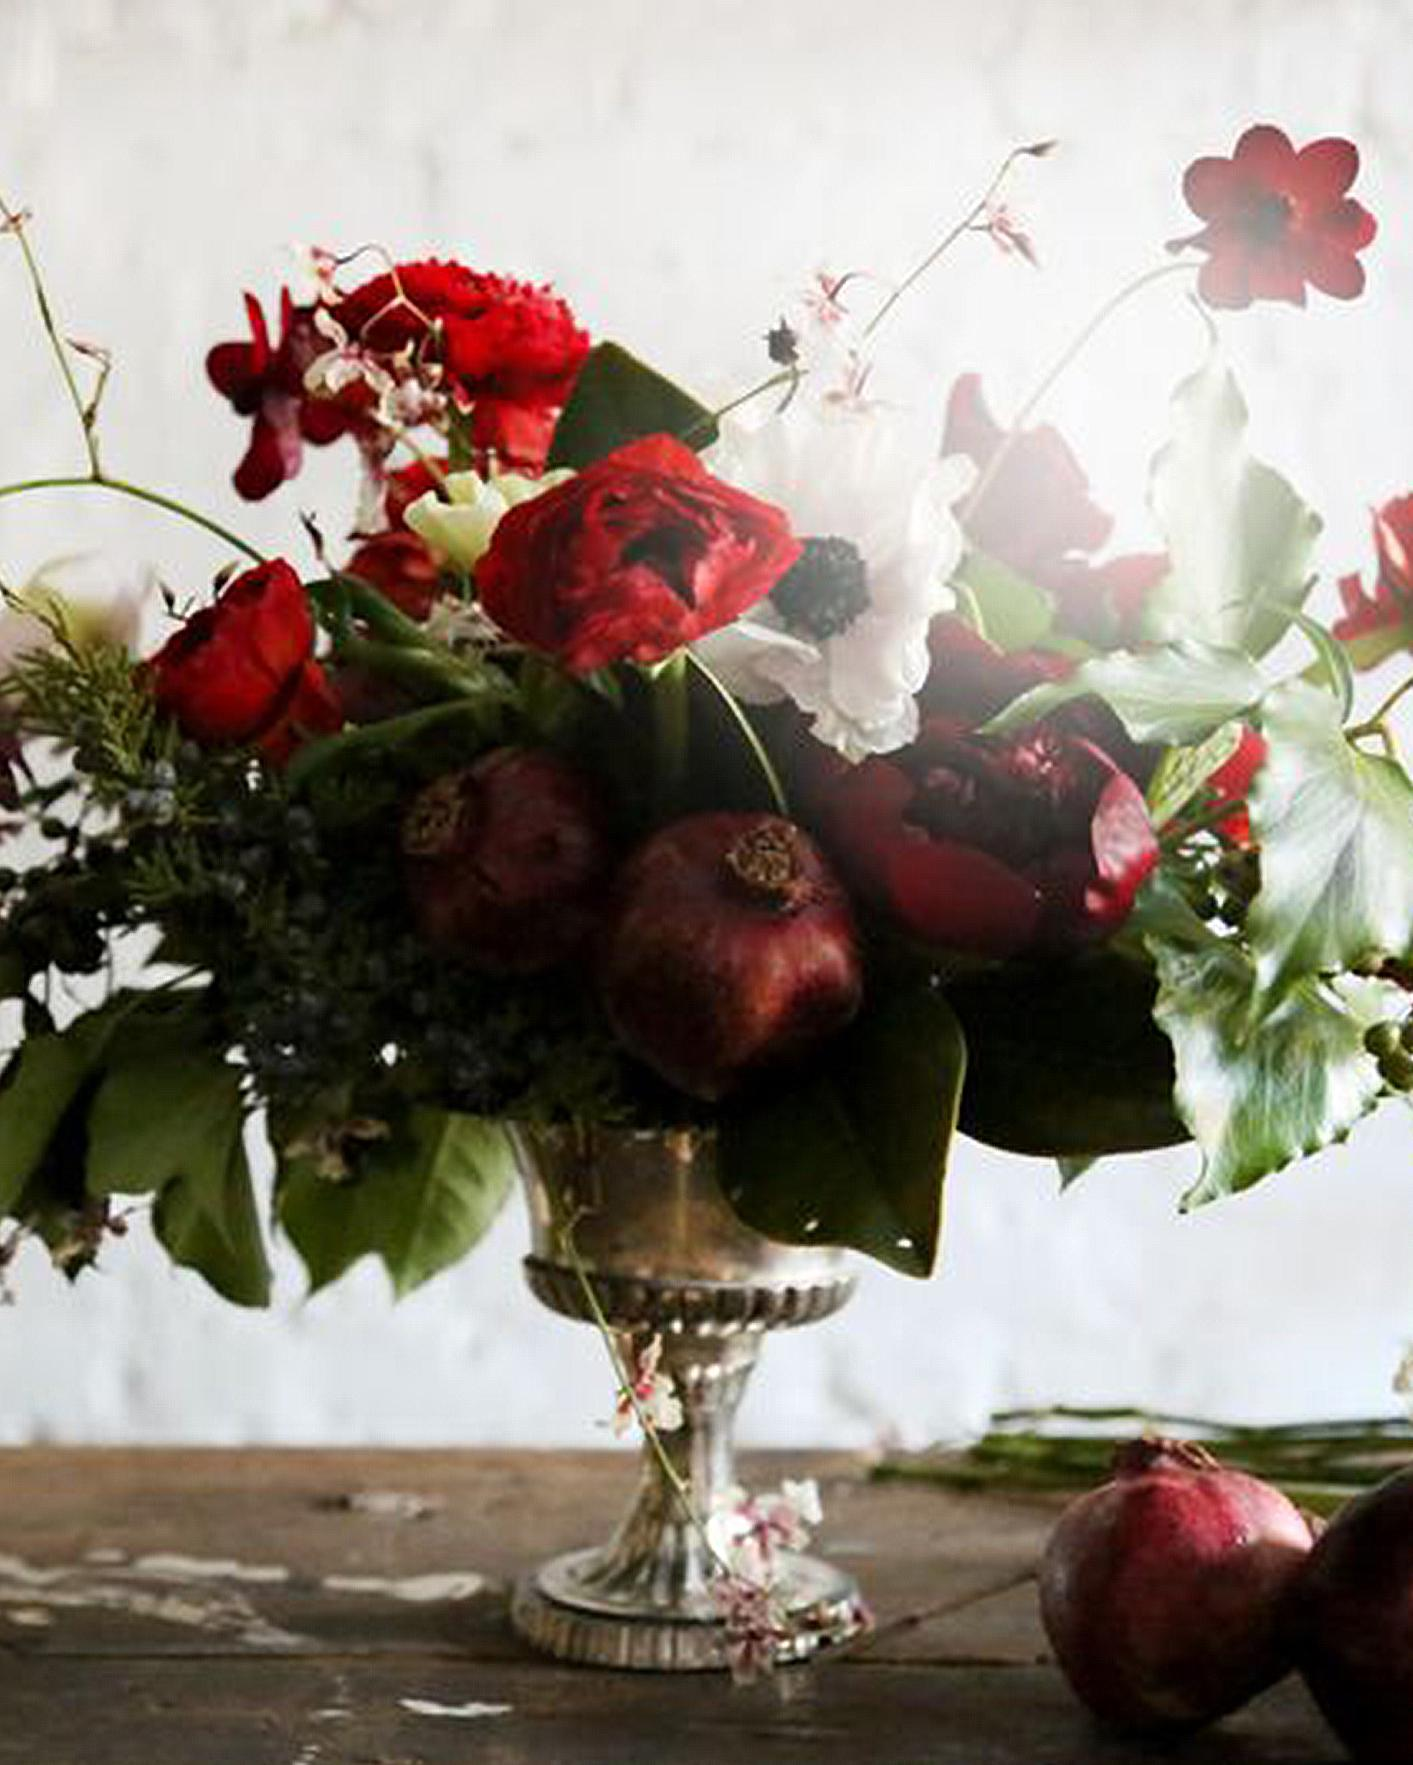 romantic-red-pomegranate-arrangement-0116